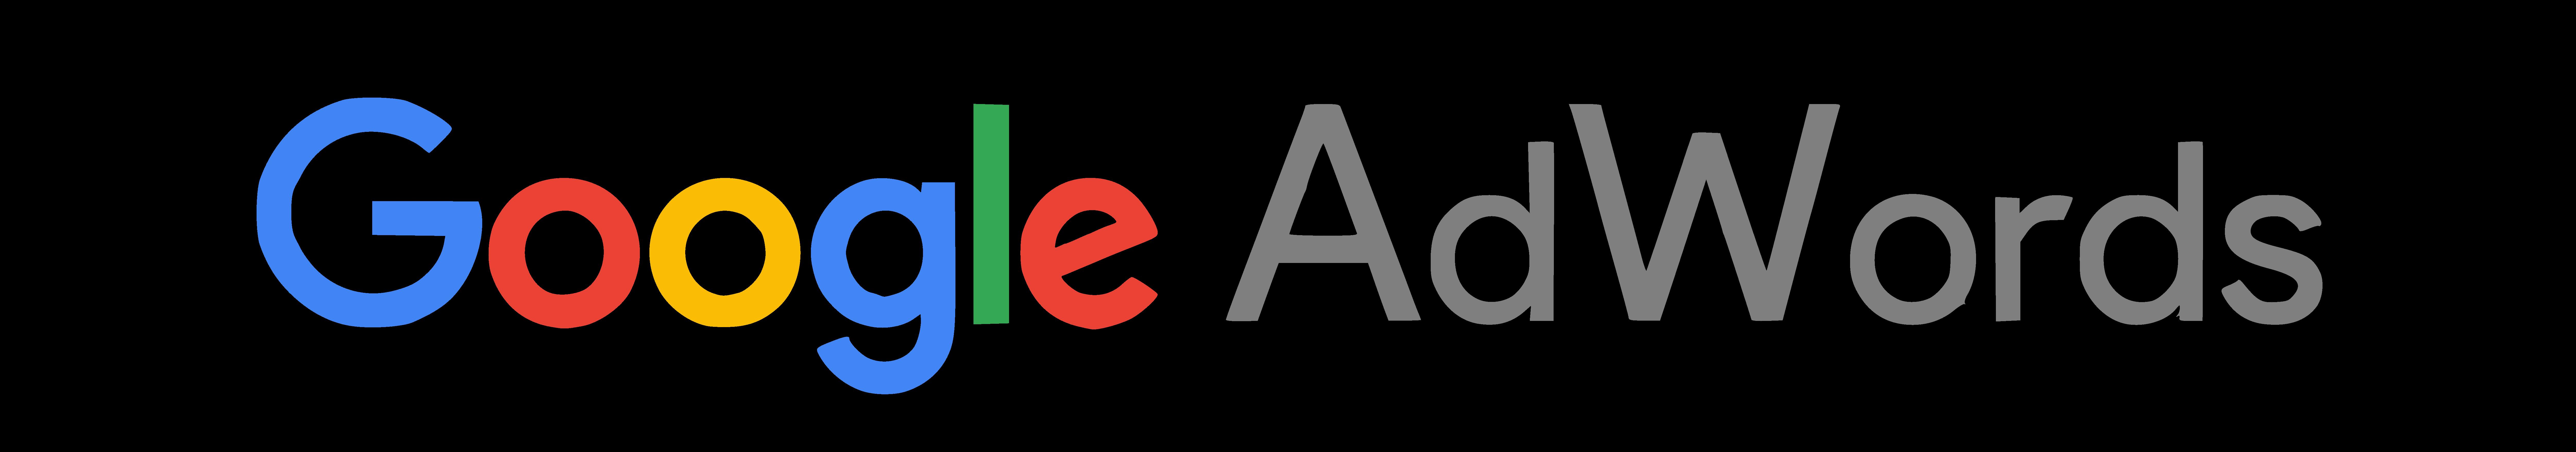 Google Adwords Logo PNG Image